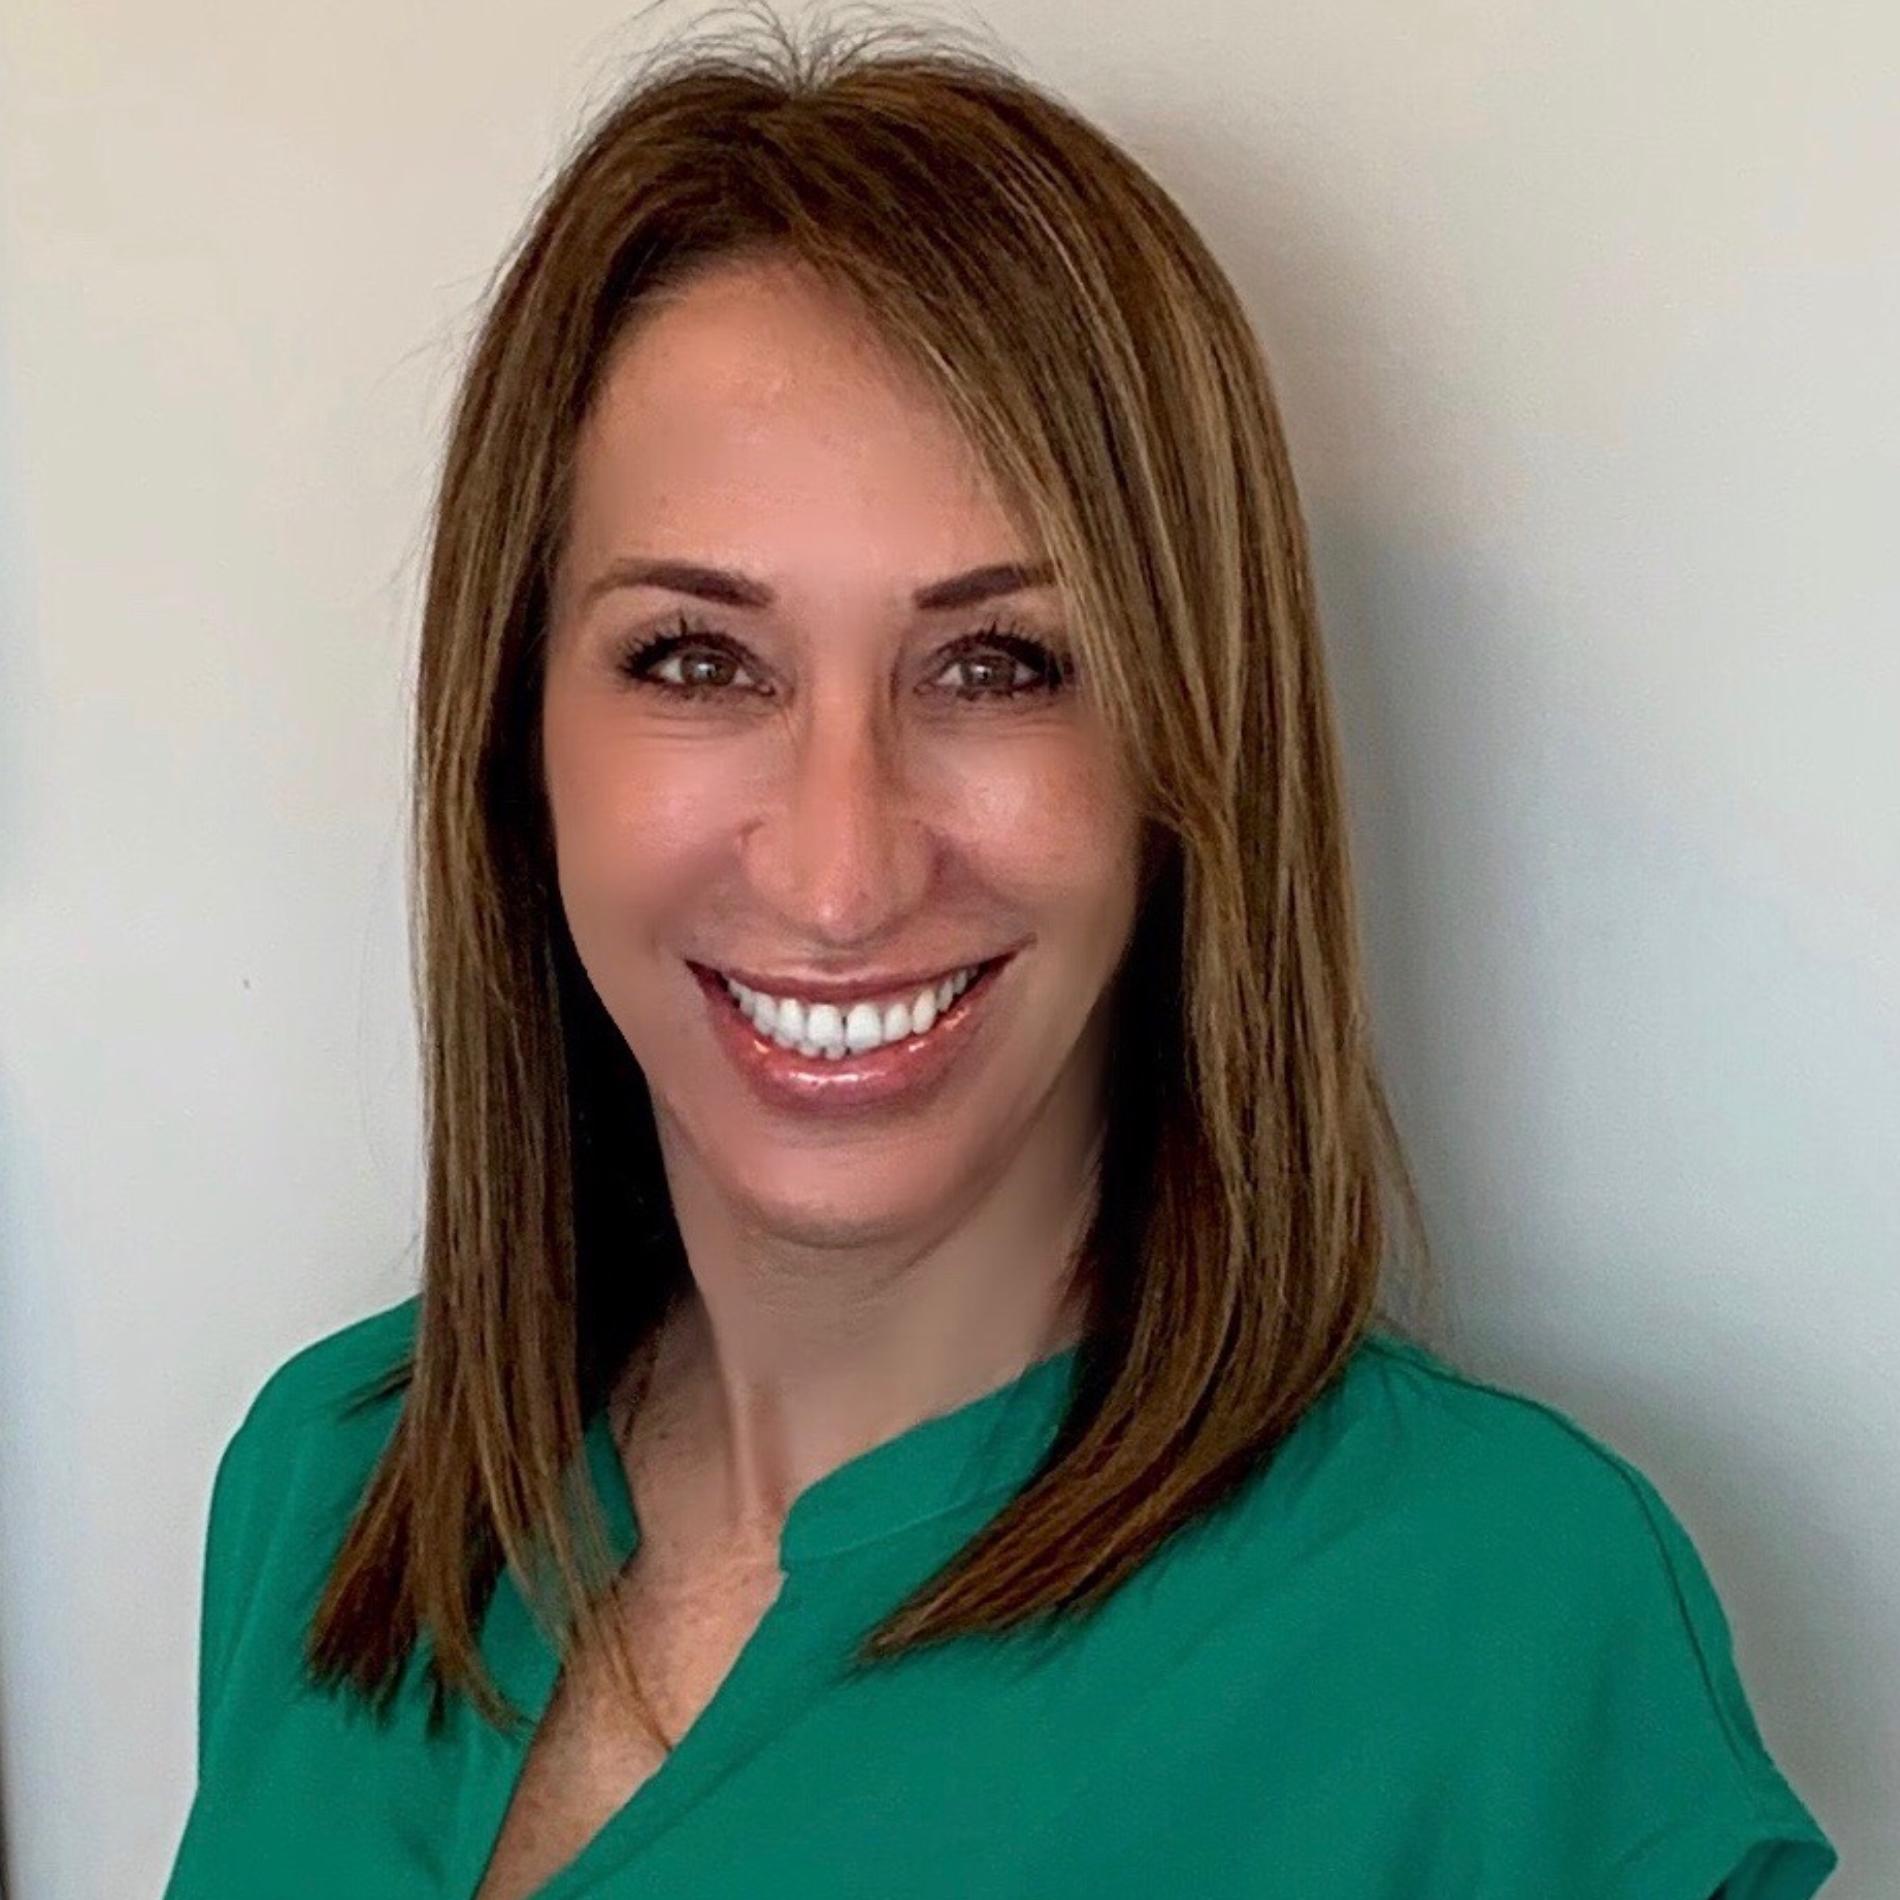 Profile Image of Micaela Simon Family Nurse Practitioner